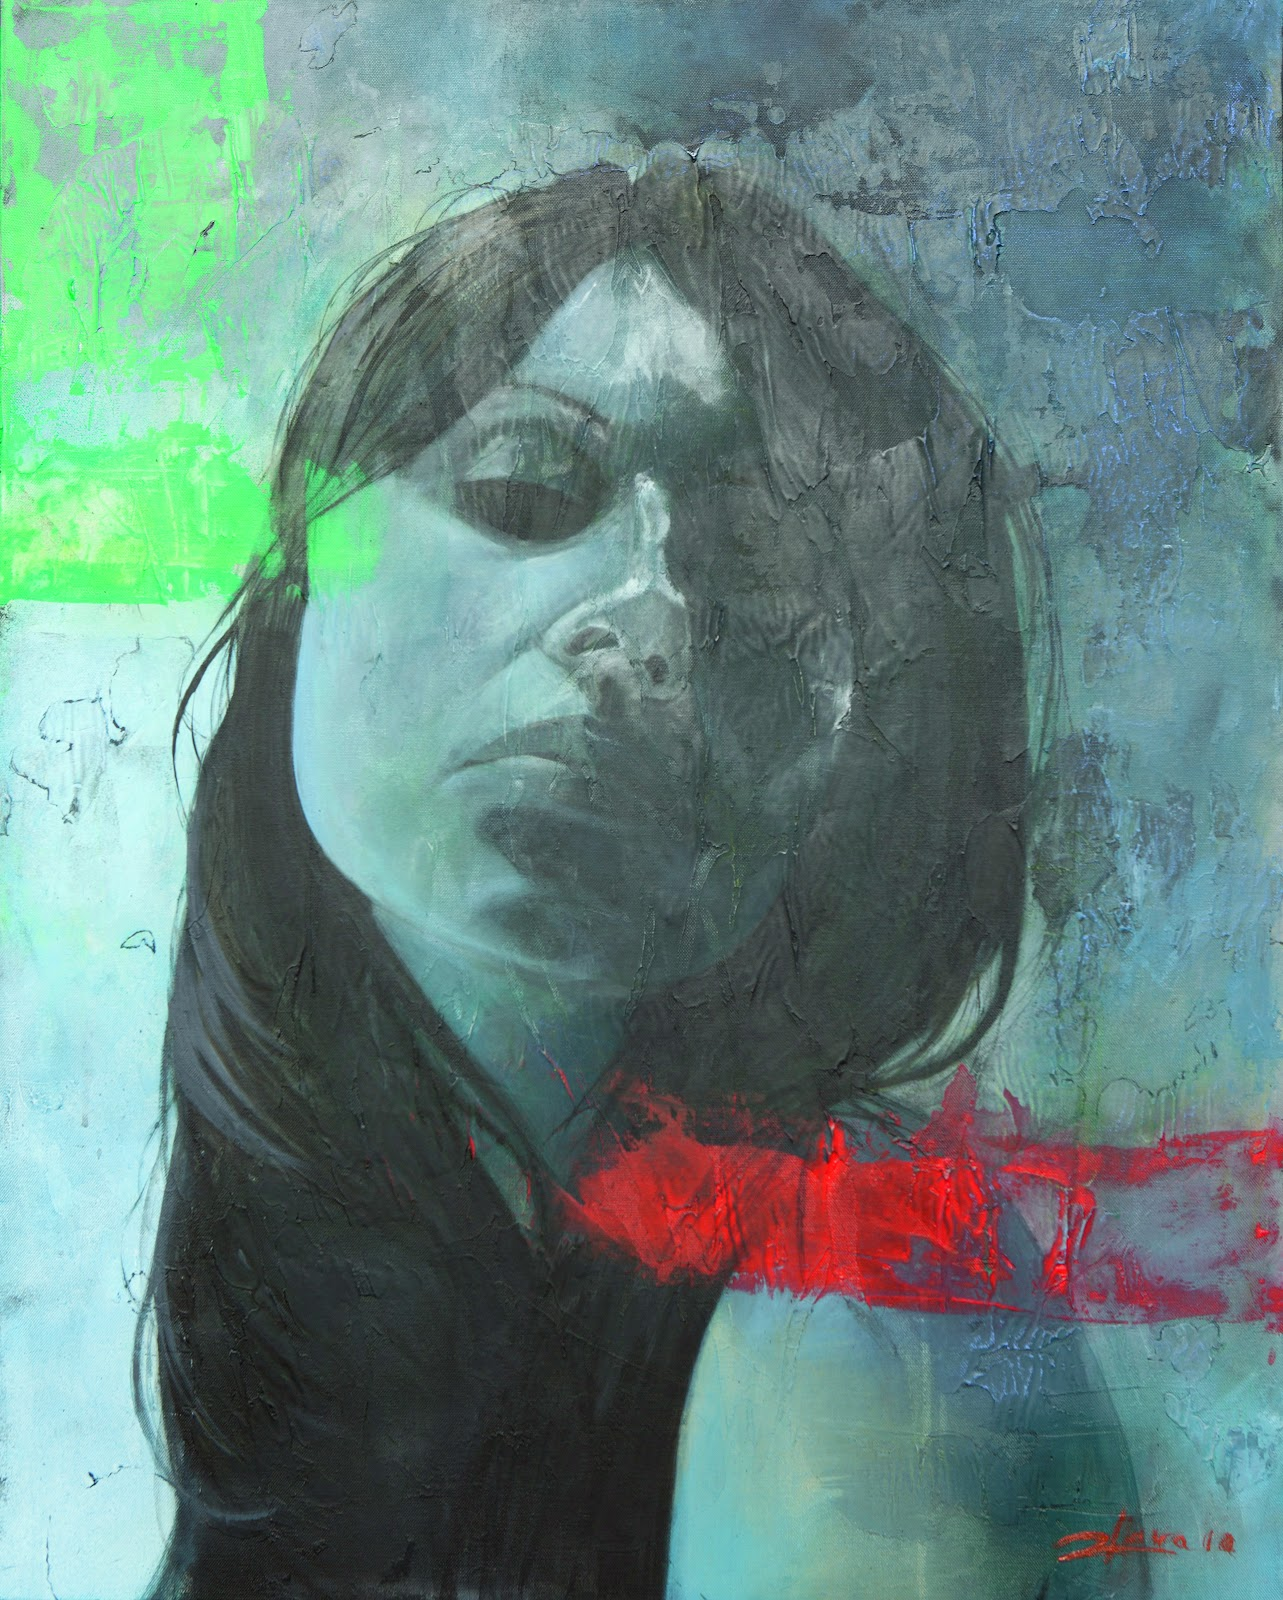 María Azul. Técnica mixta al óleo sobre lienzo. 100cm x 80cm